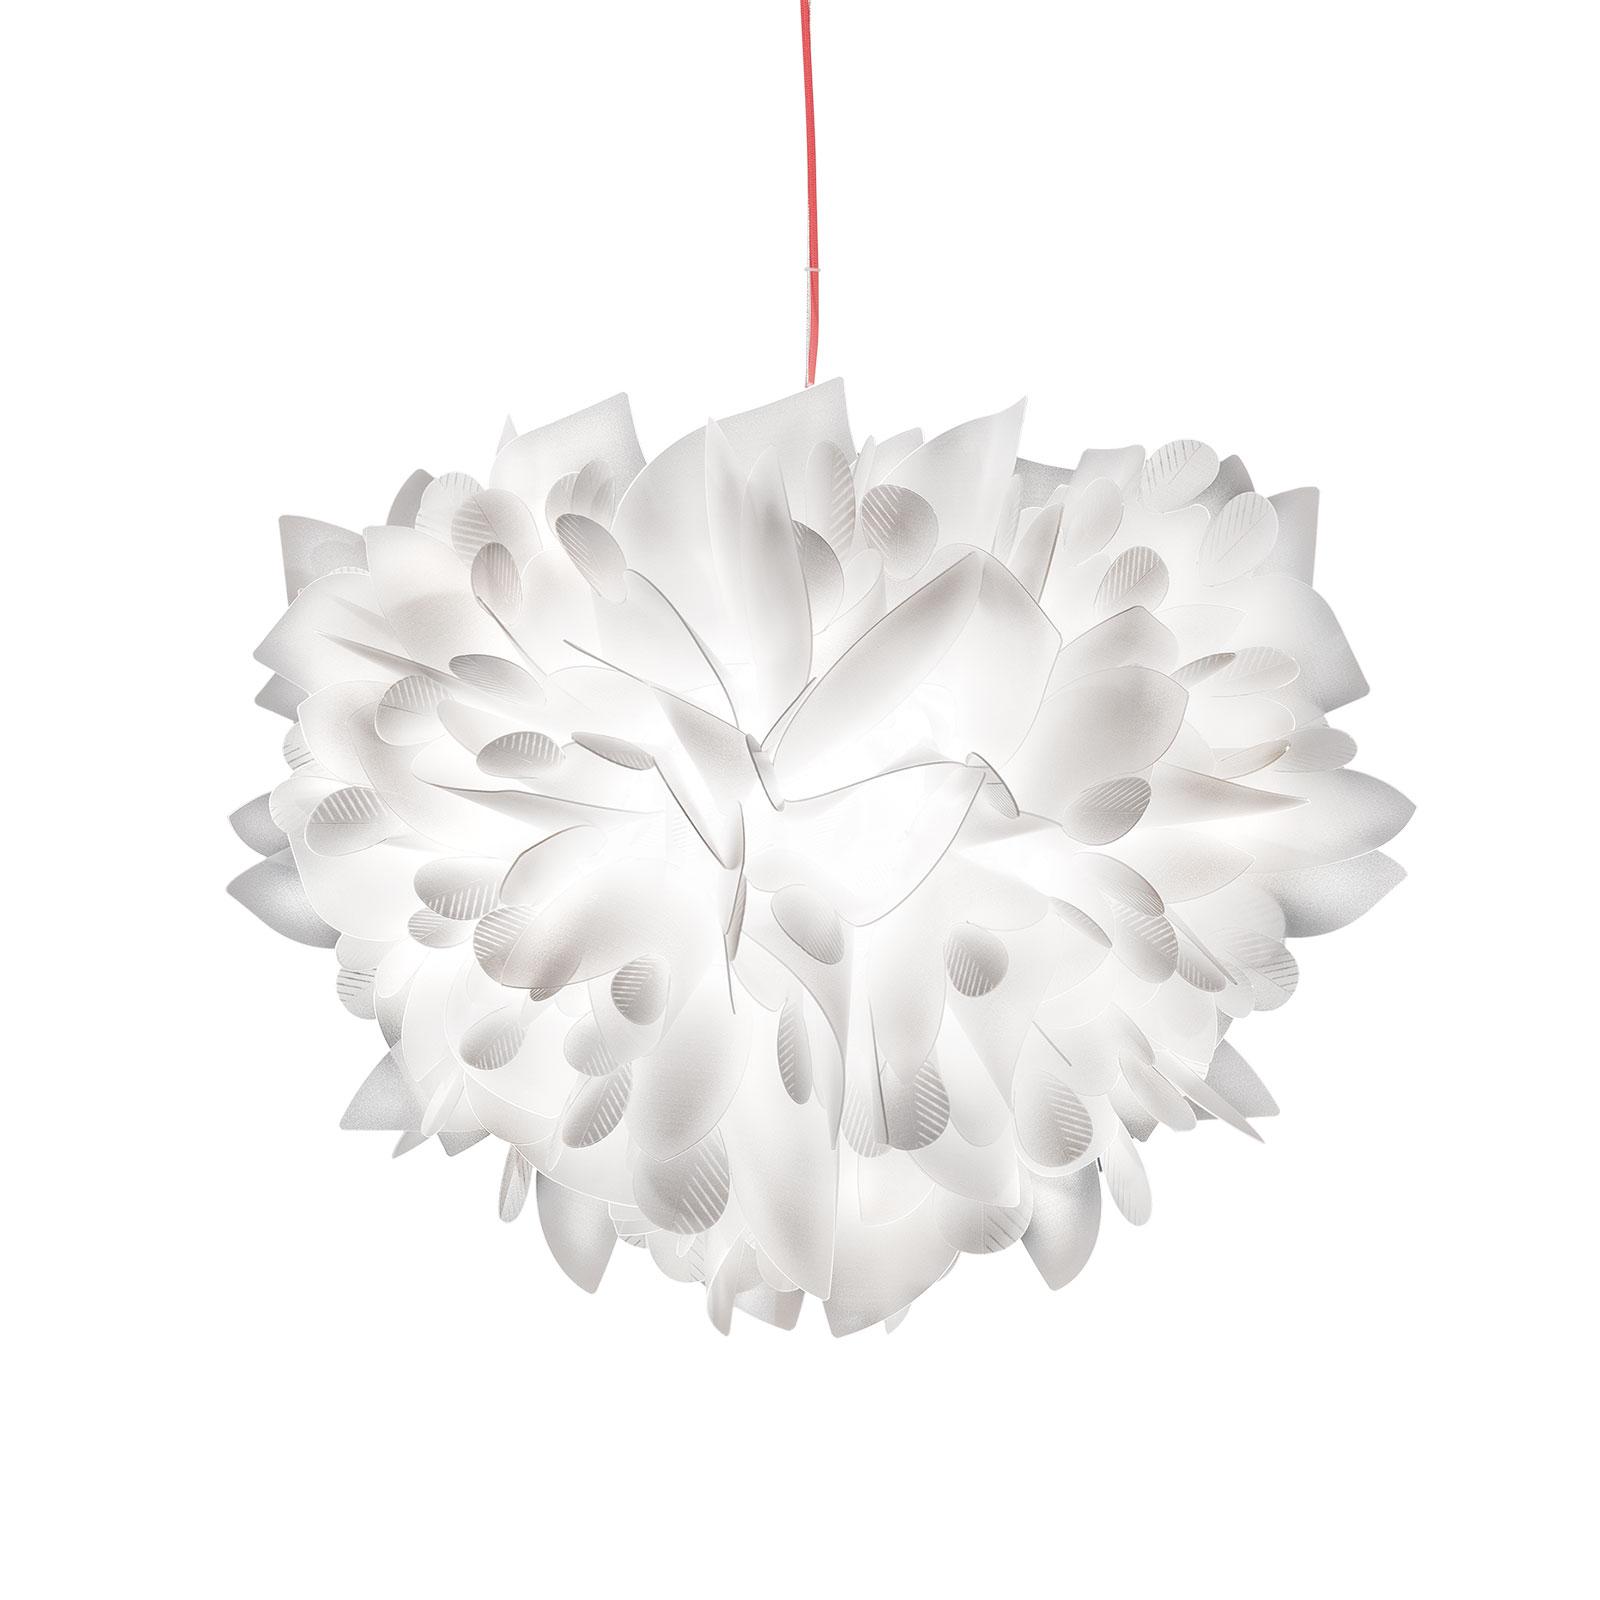 Slamp Veli Foliage hanglamp wit-rood Ø 45cm